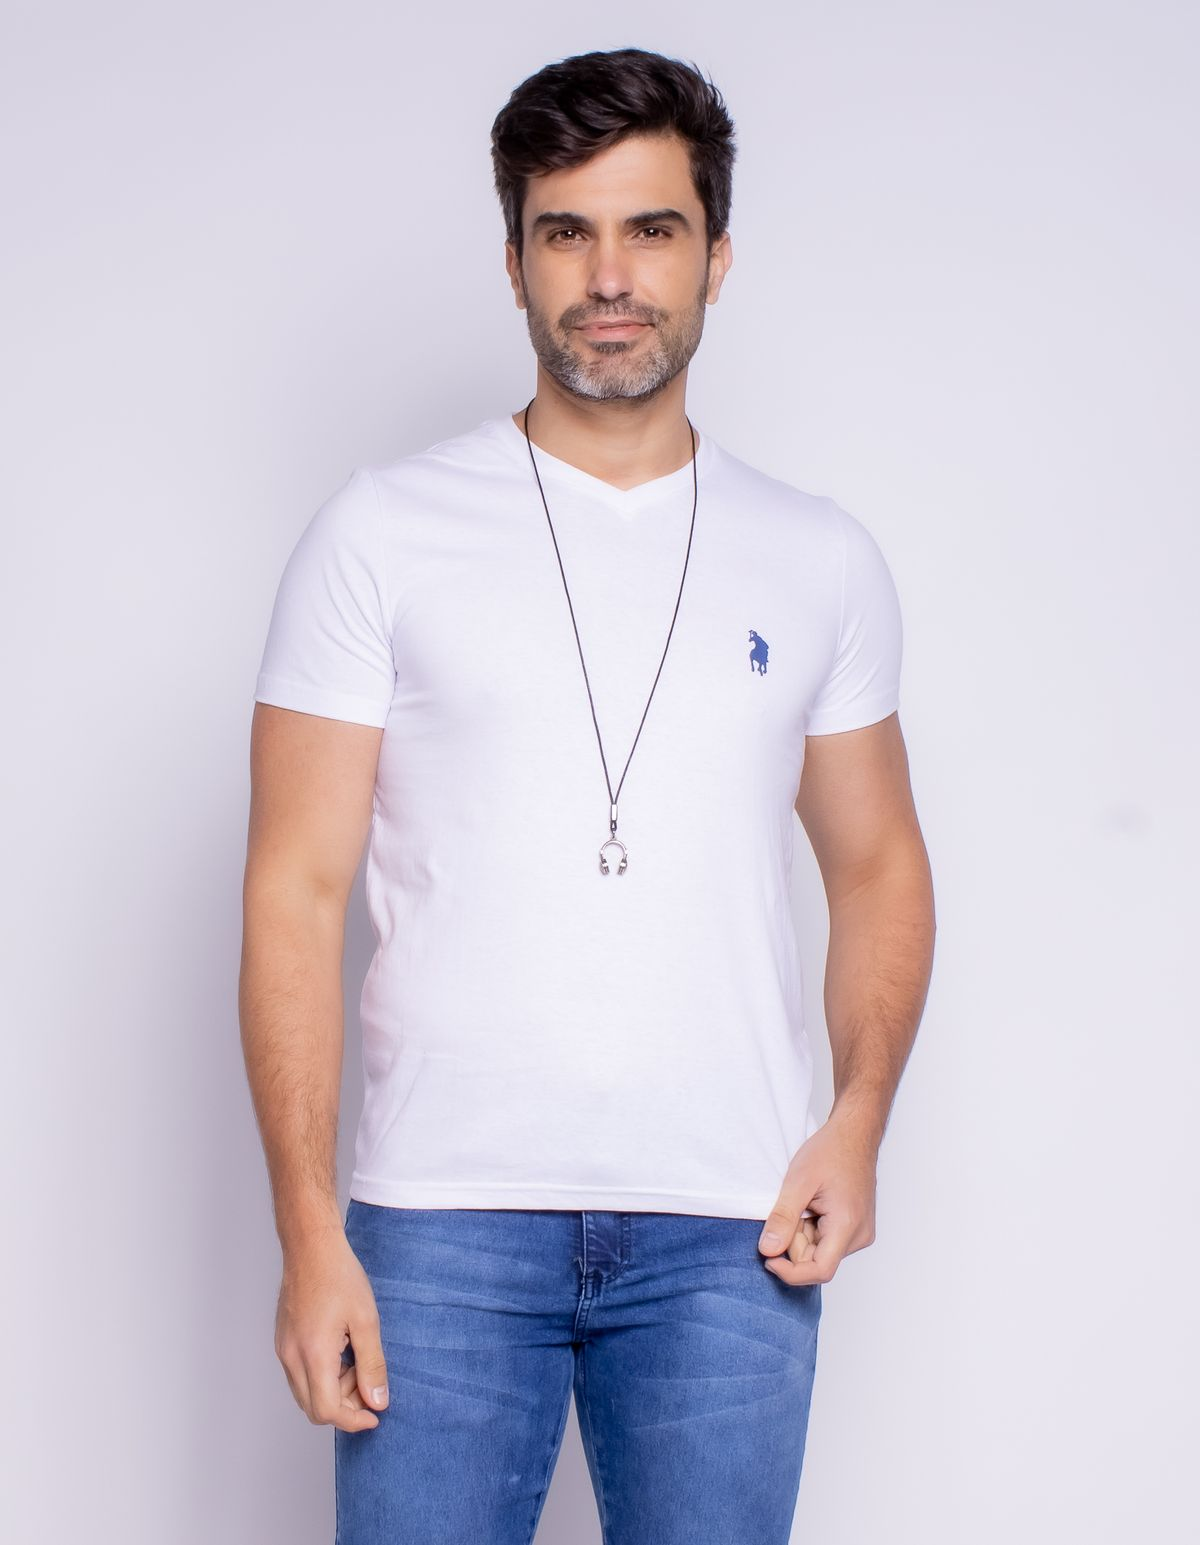 511521005-camiseta-manga-curta-basica-masculina-gola-v-branco-p-ac5